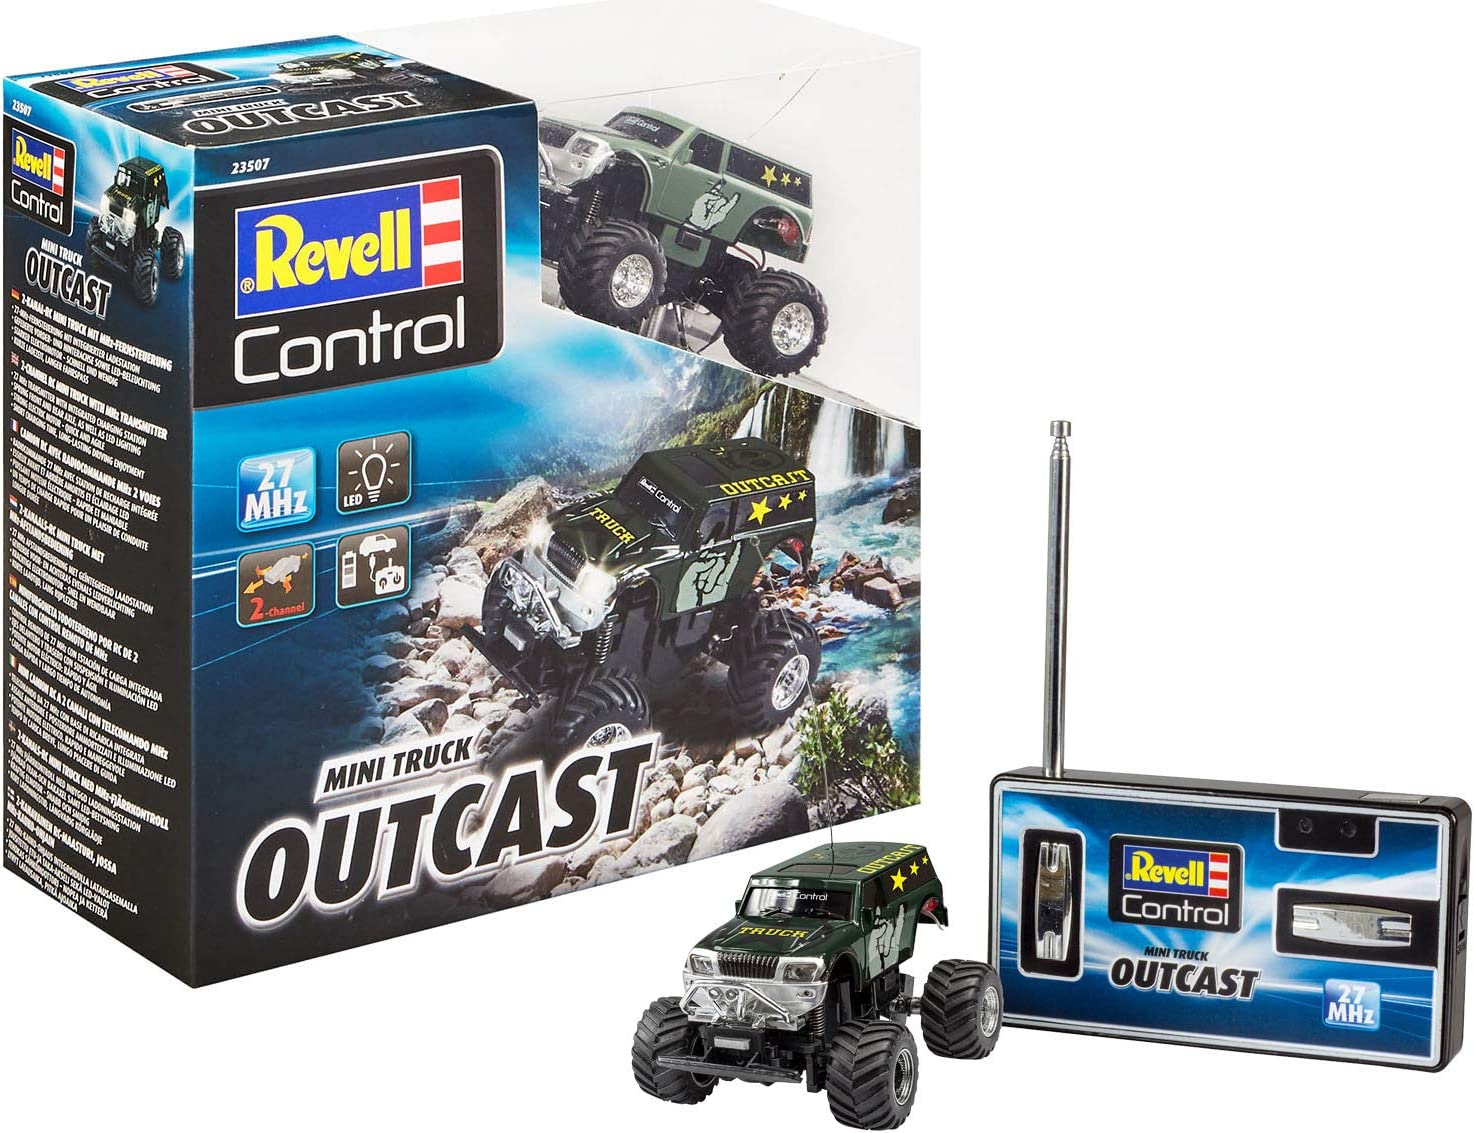 Revell-Mini RC Truck Outcast Juguetes a Control Remoto, Multicolor, Länge: ca. 8 cm (23507)